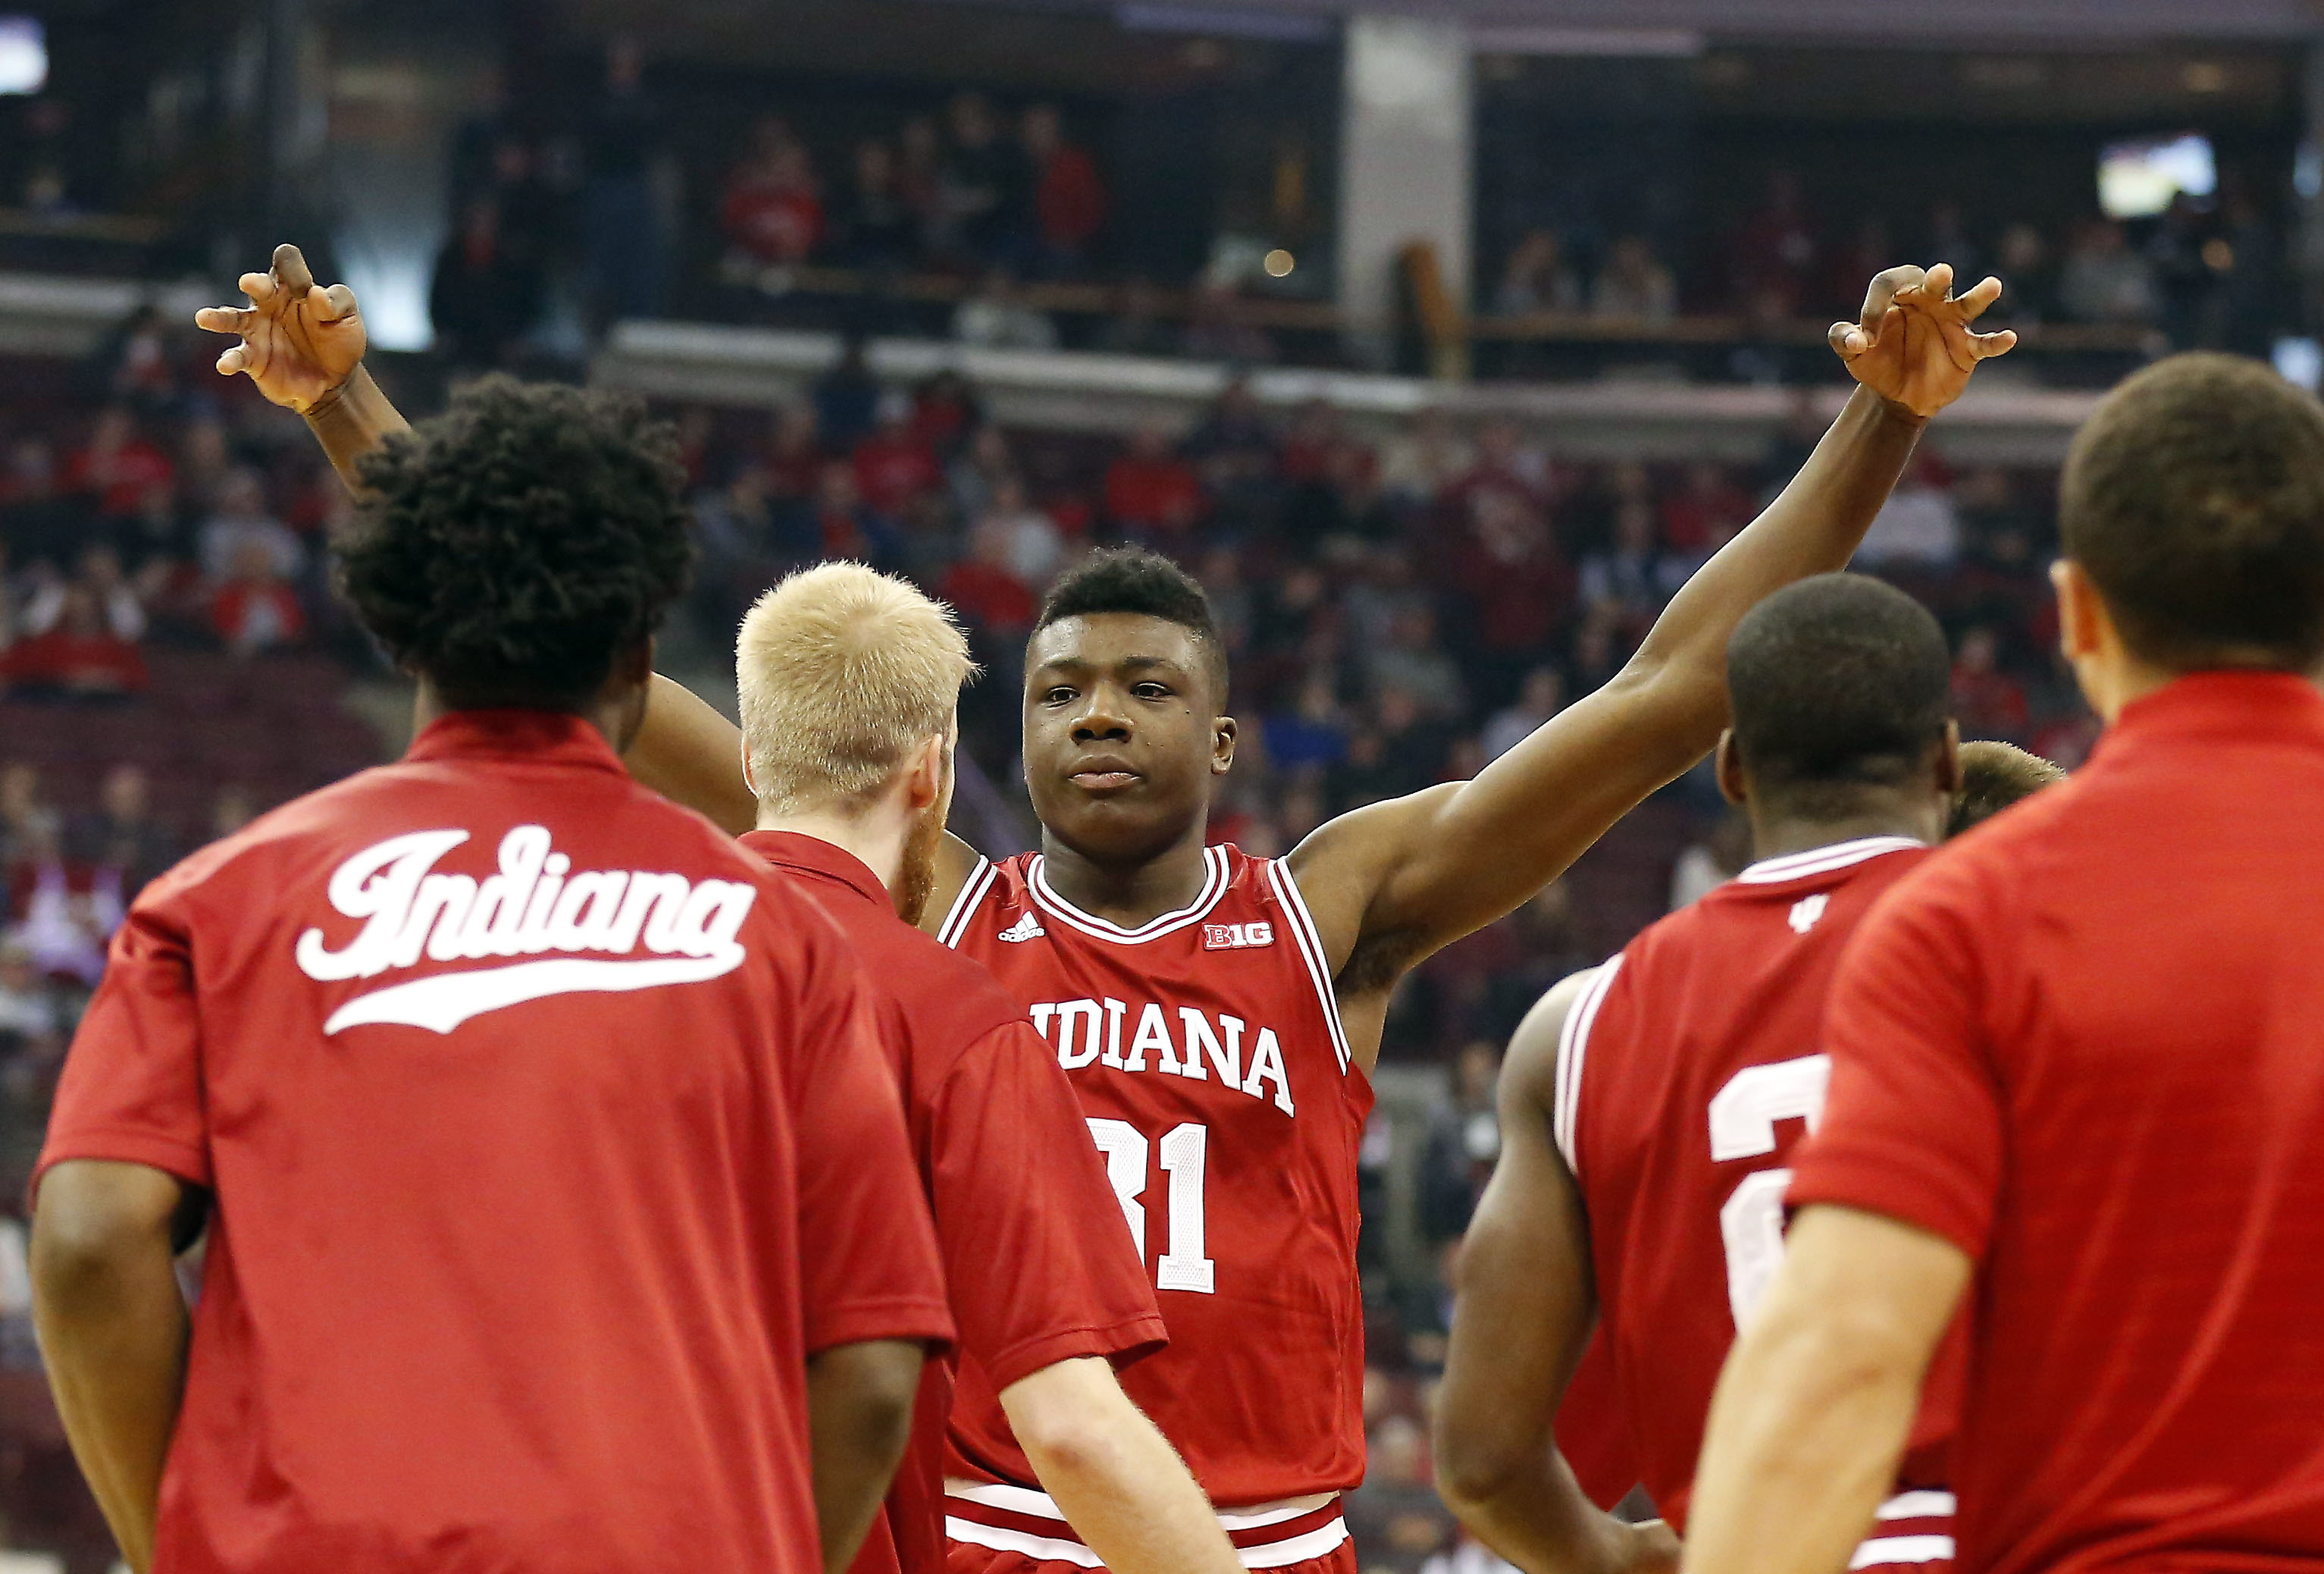 Indiana Syracuse Auburn Lead Ncaa Tournament Bubble: College Basketball Big Ten Power Rankings: Week 18